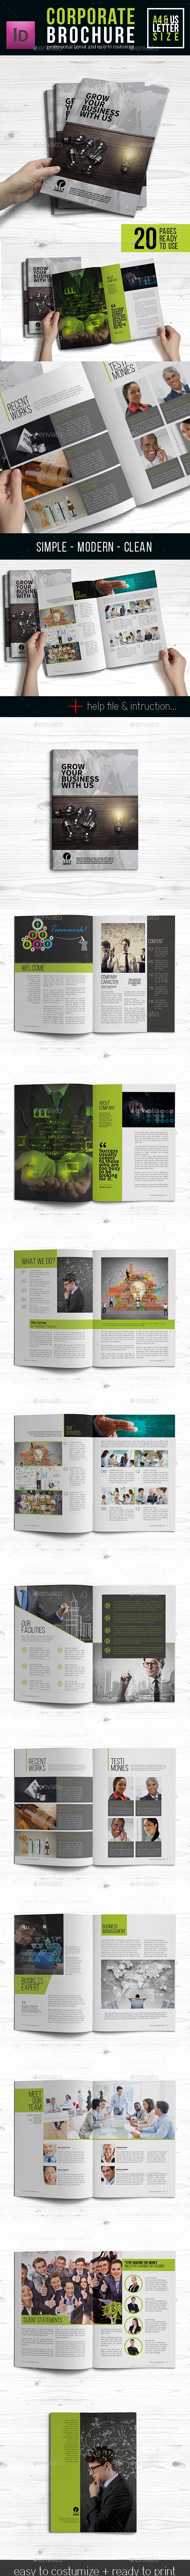 Corporate Brochure V5 - Corporate Brochures